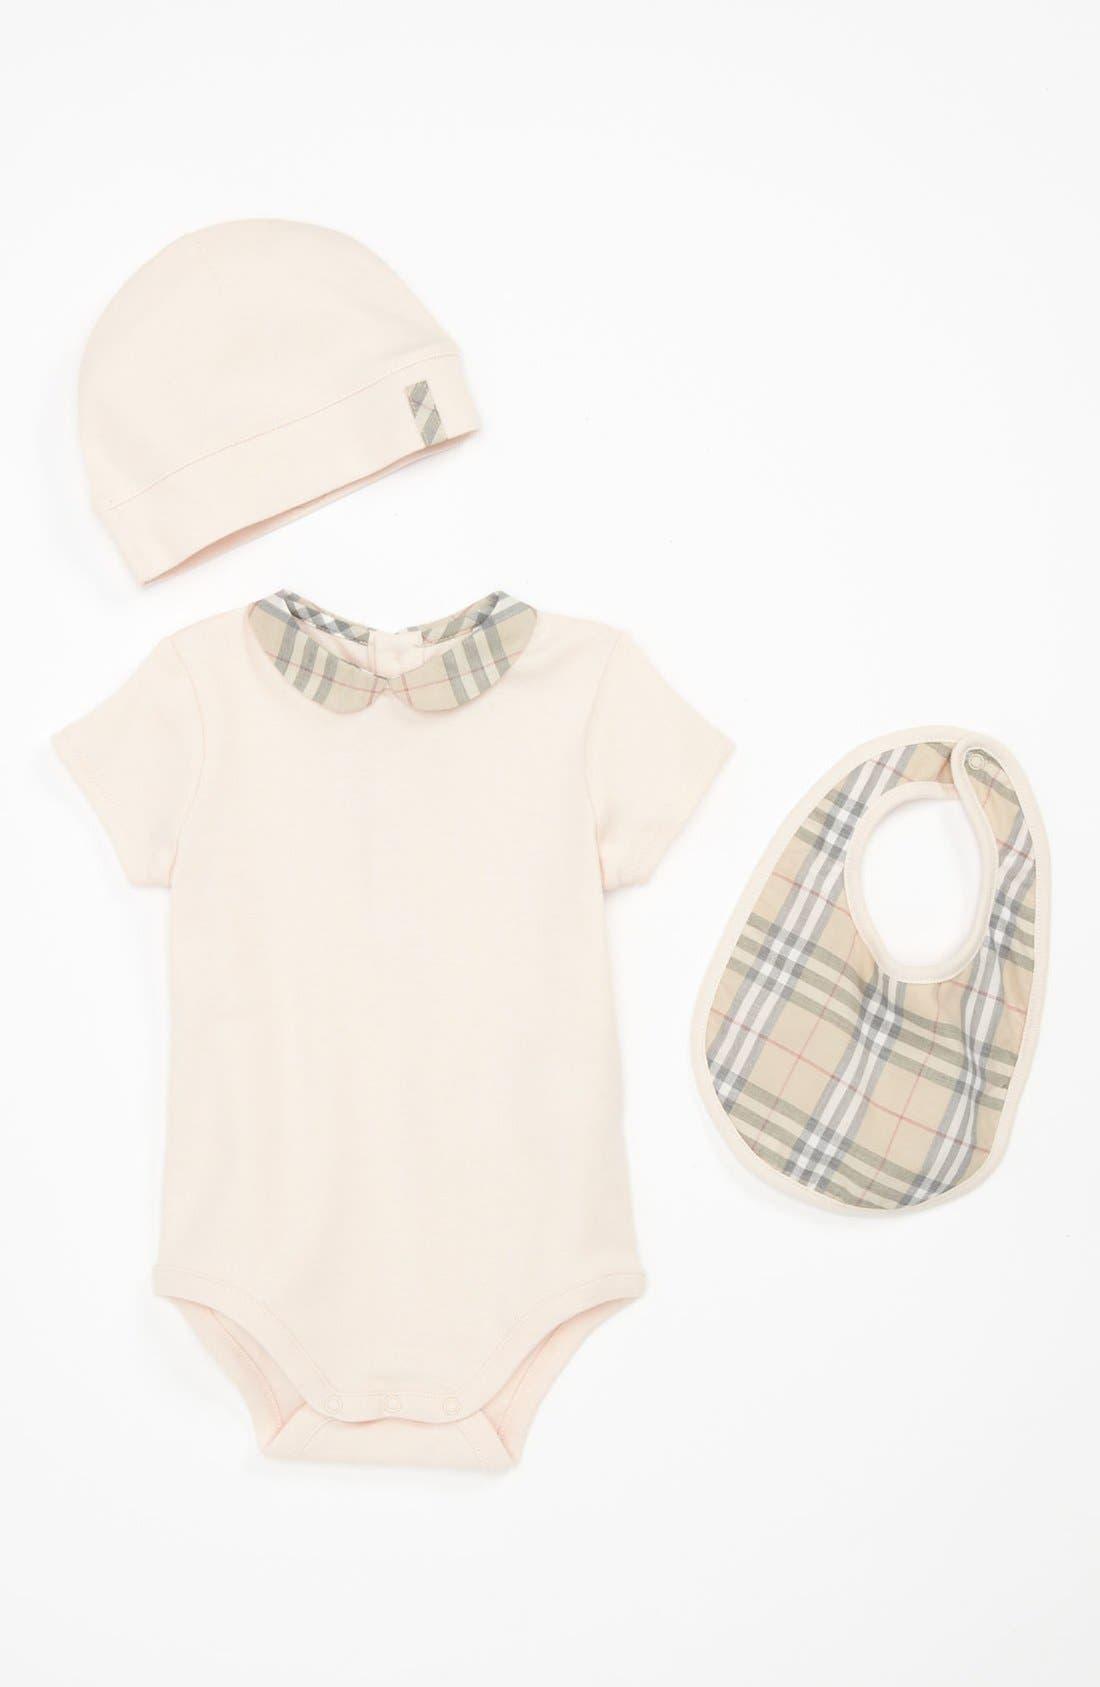 Main Image - Burberry Bodysuit, Bib & Hat Gift Set (Baby)